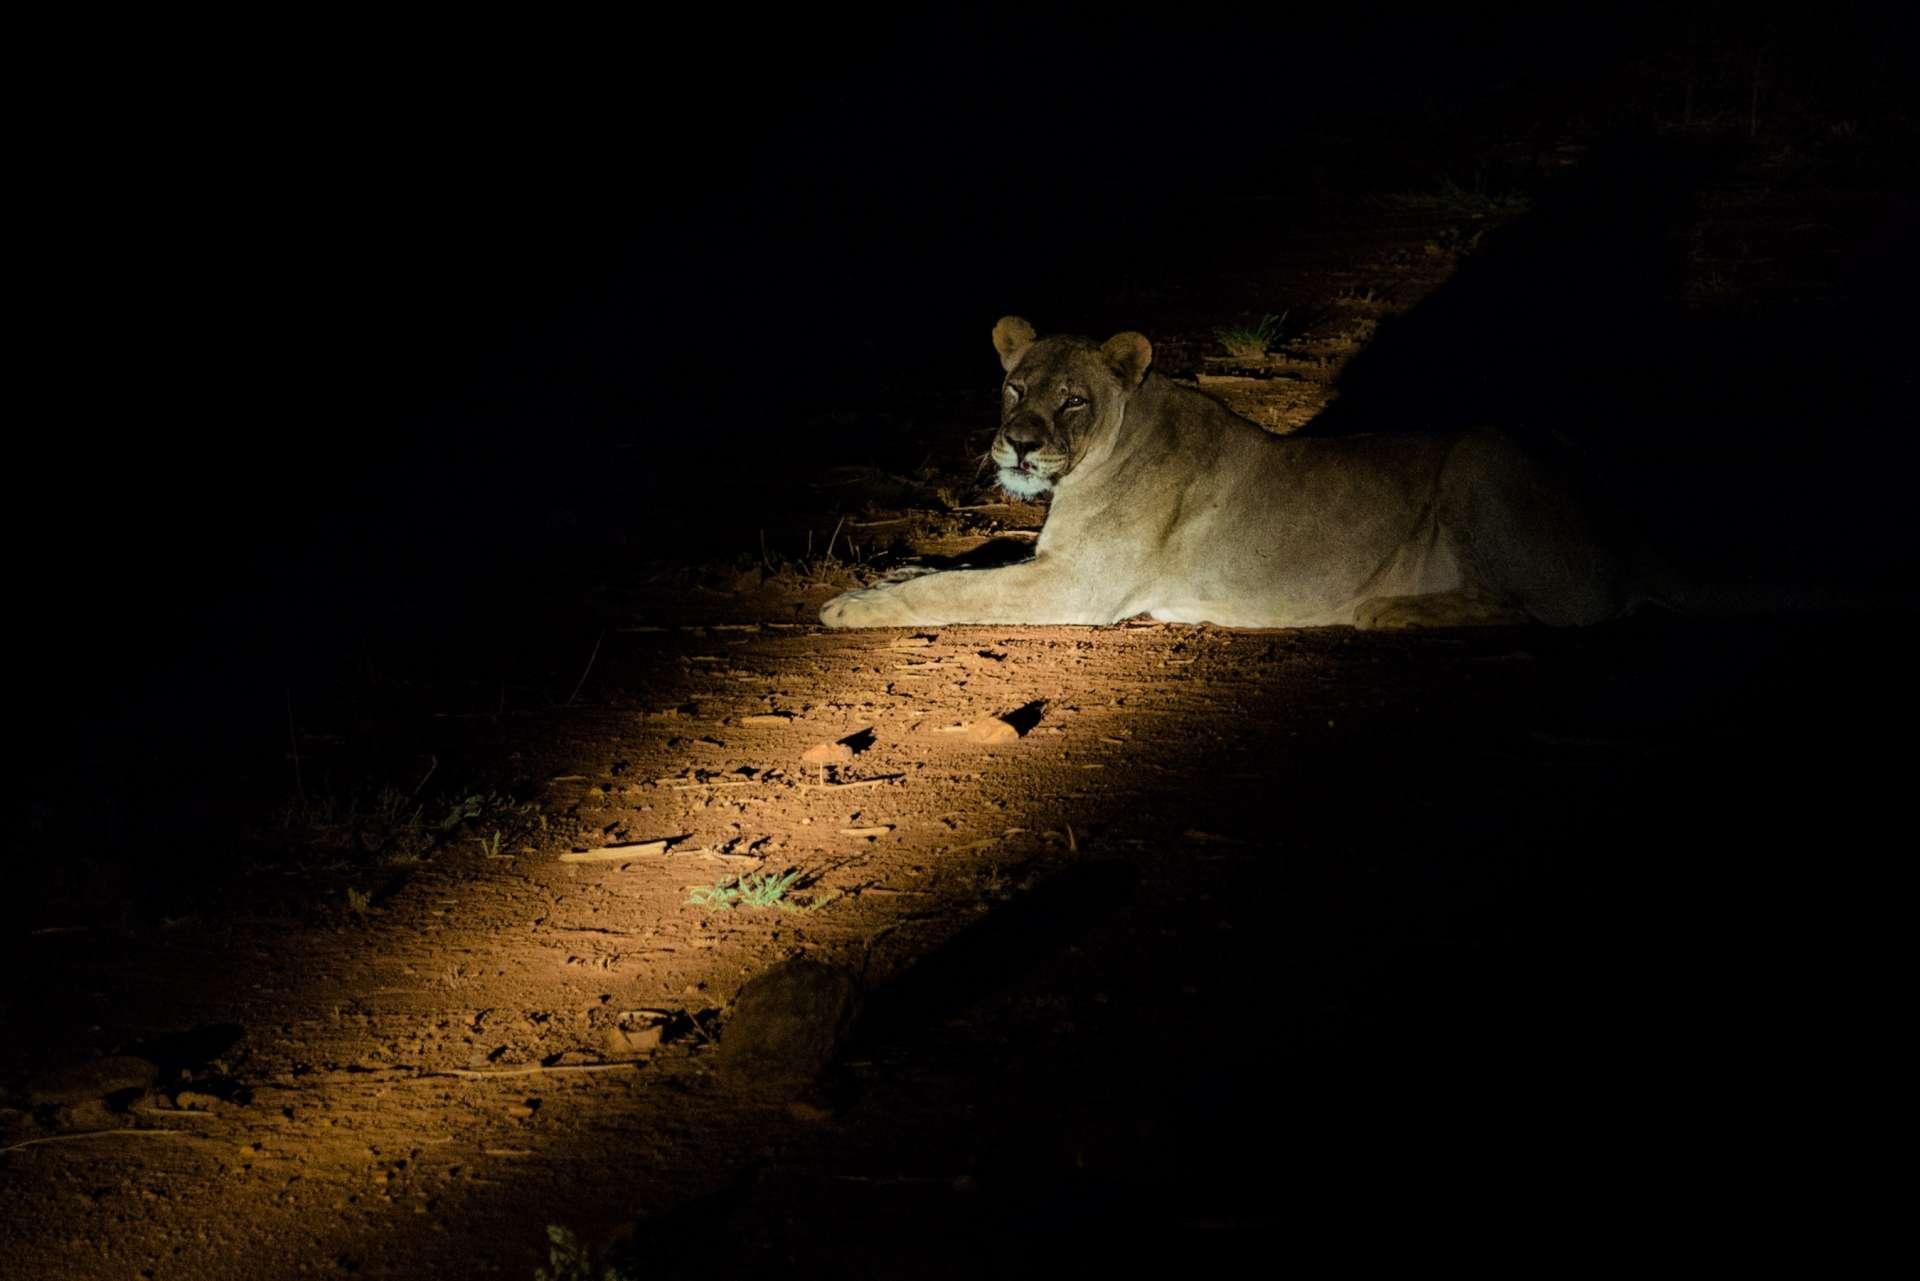 south africa madikwe safari pescart lioness by night